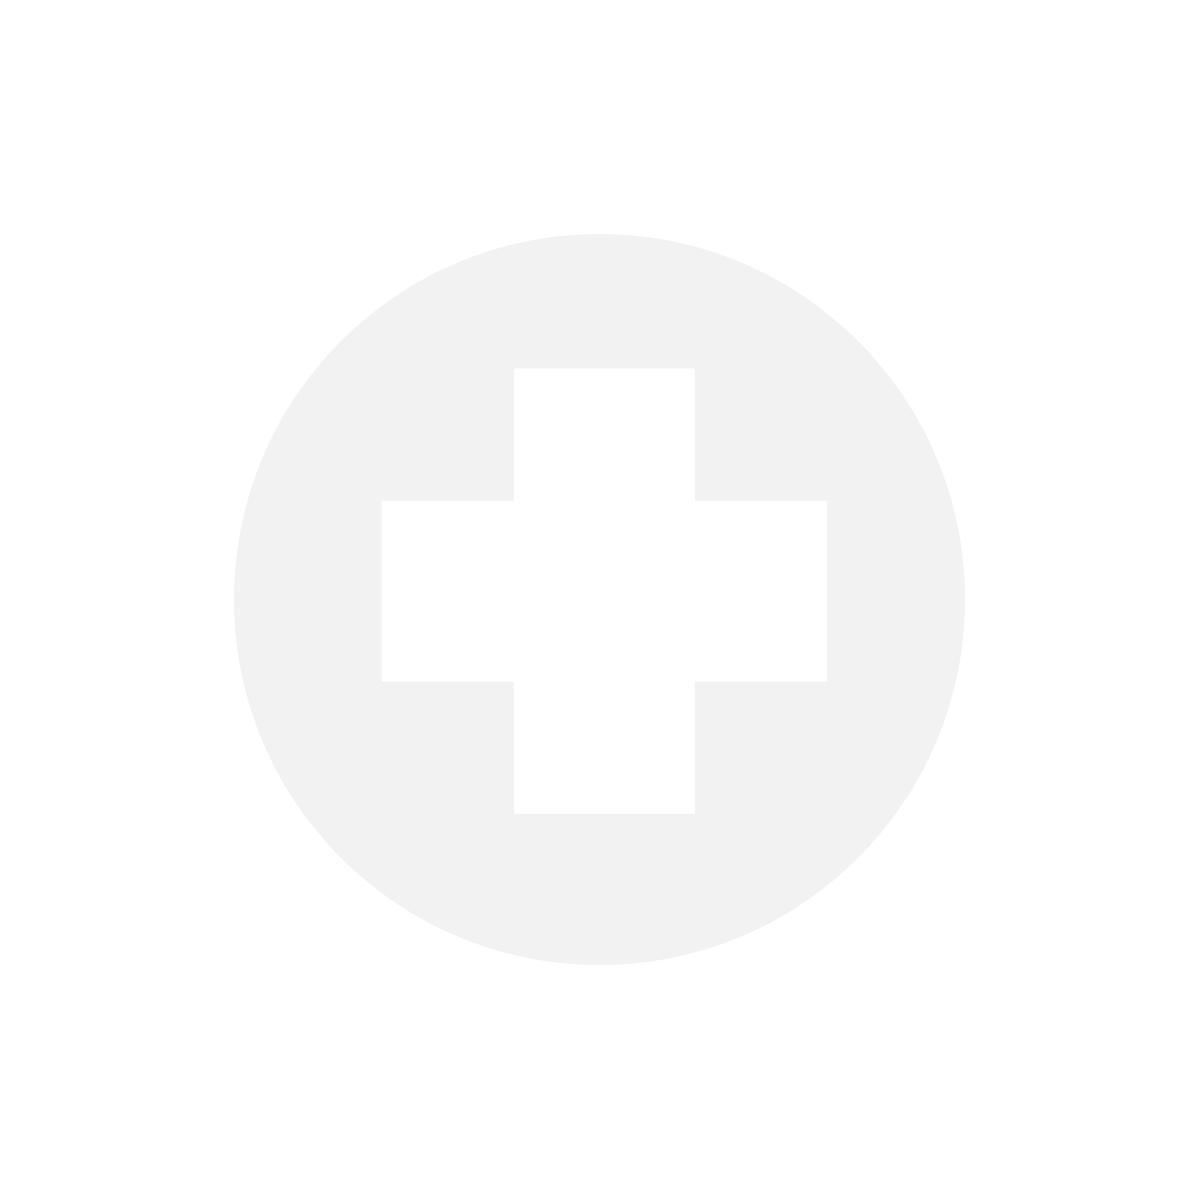 Bas - Veinax A.T.E. Anti-thrombose T5 Long Blanc